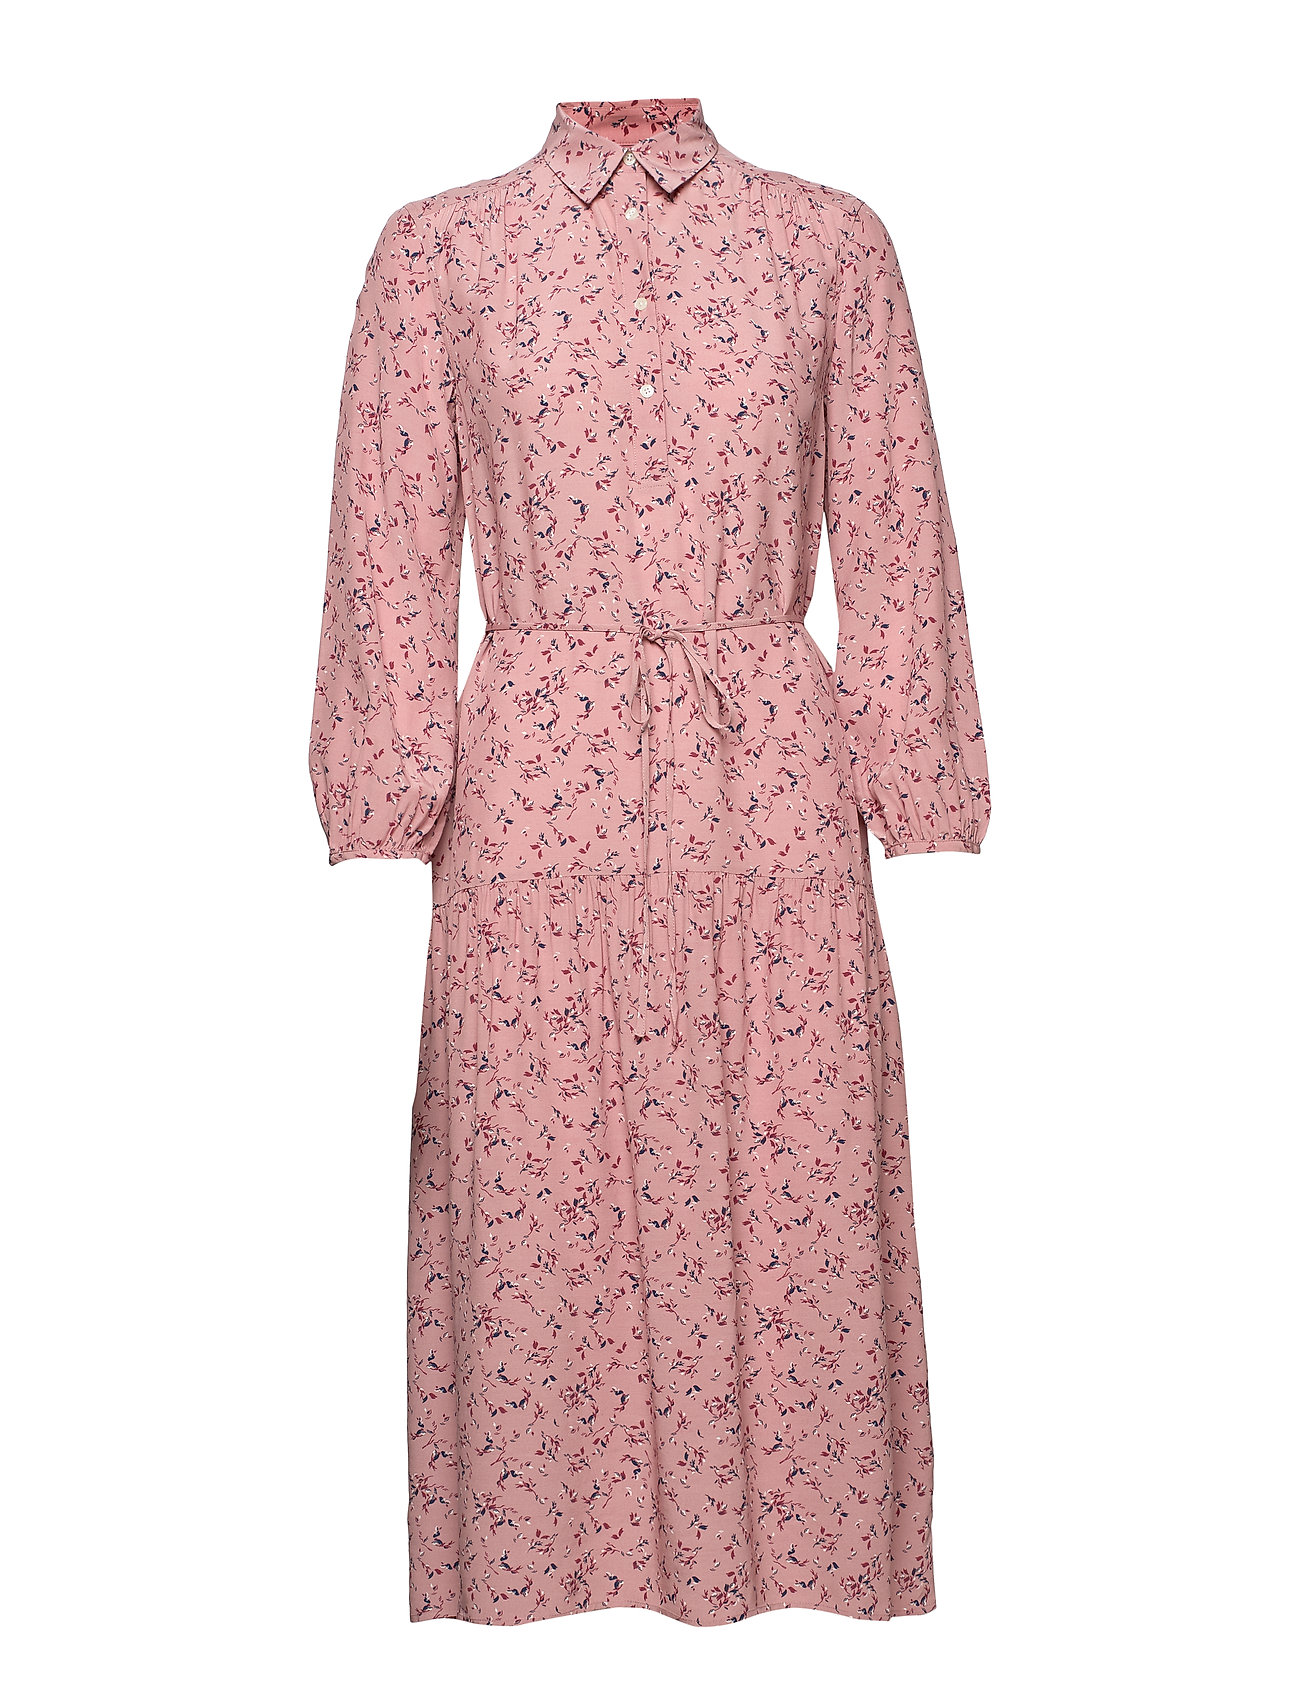 Gant D1. MULTI FLORAL SHIRT DRESS - ASH ROSE